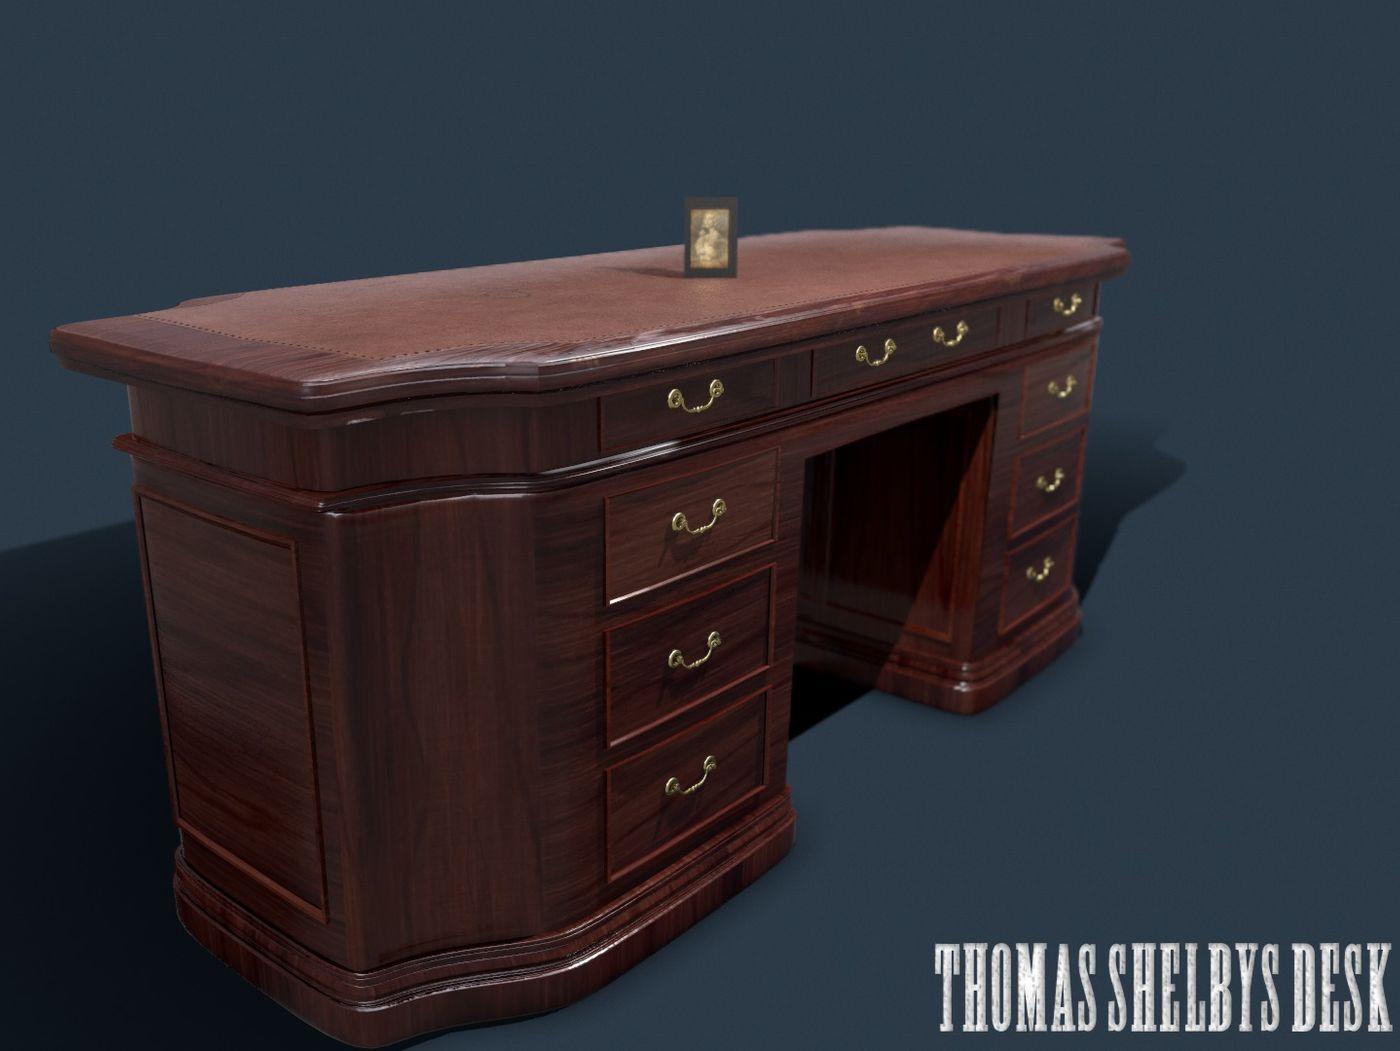 Thomas Shelby's Desk